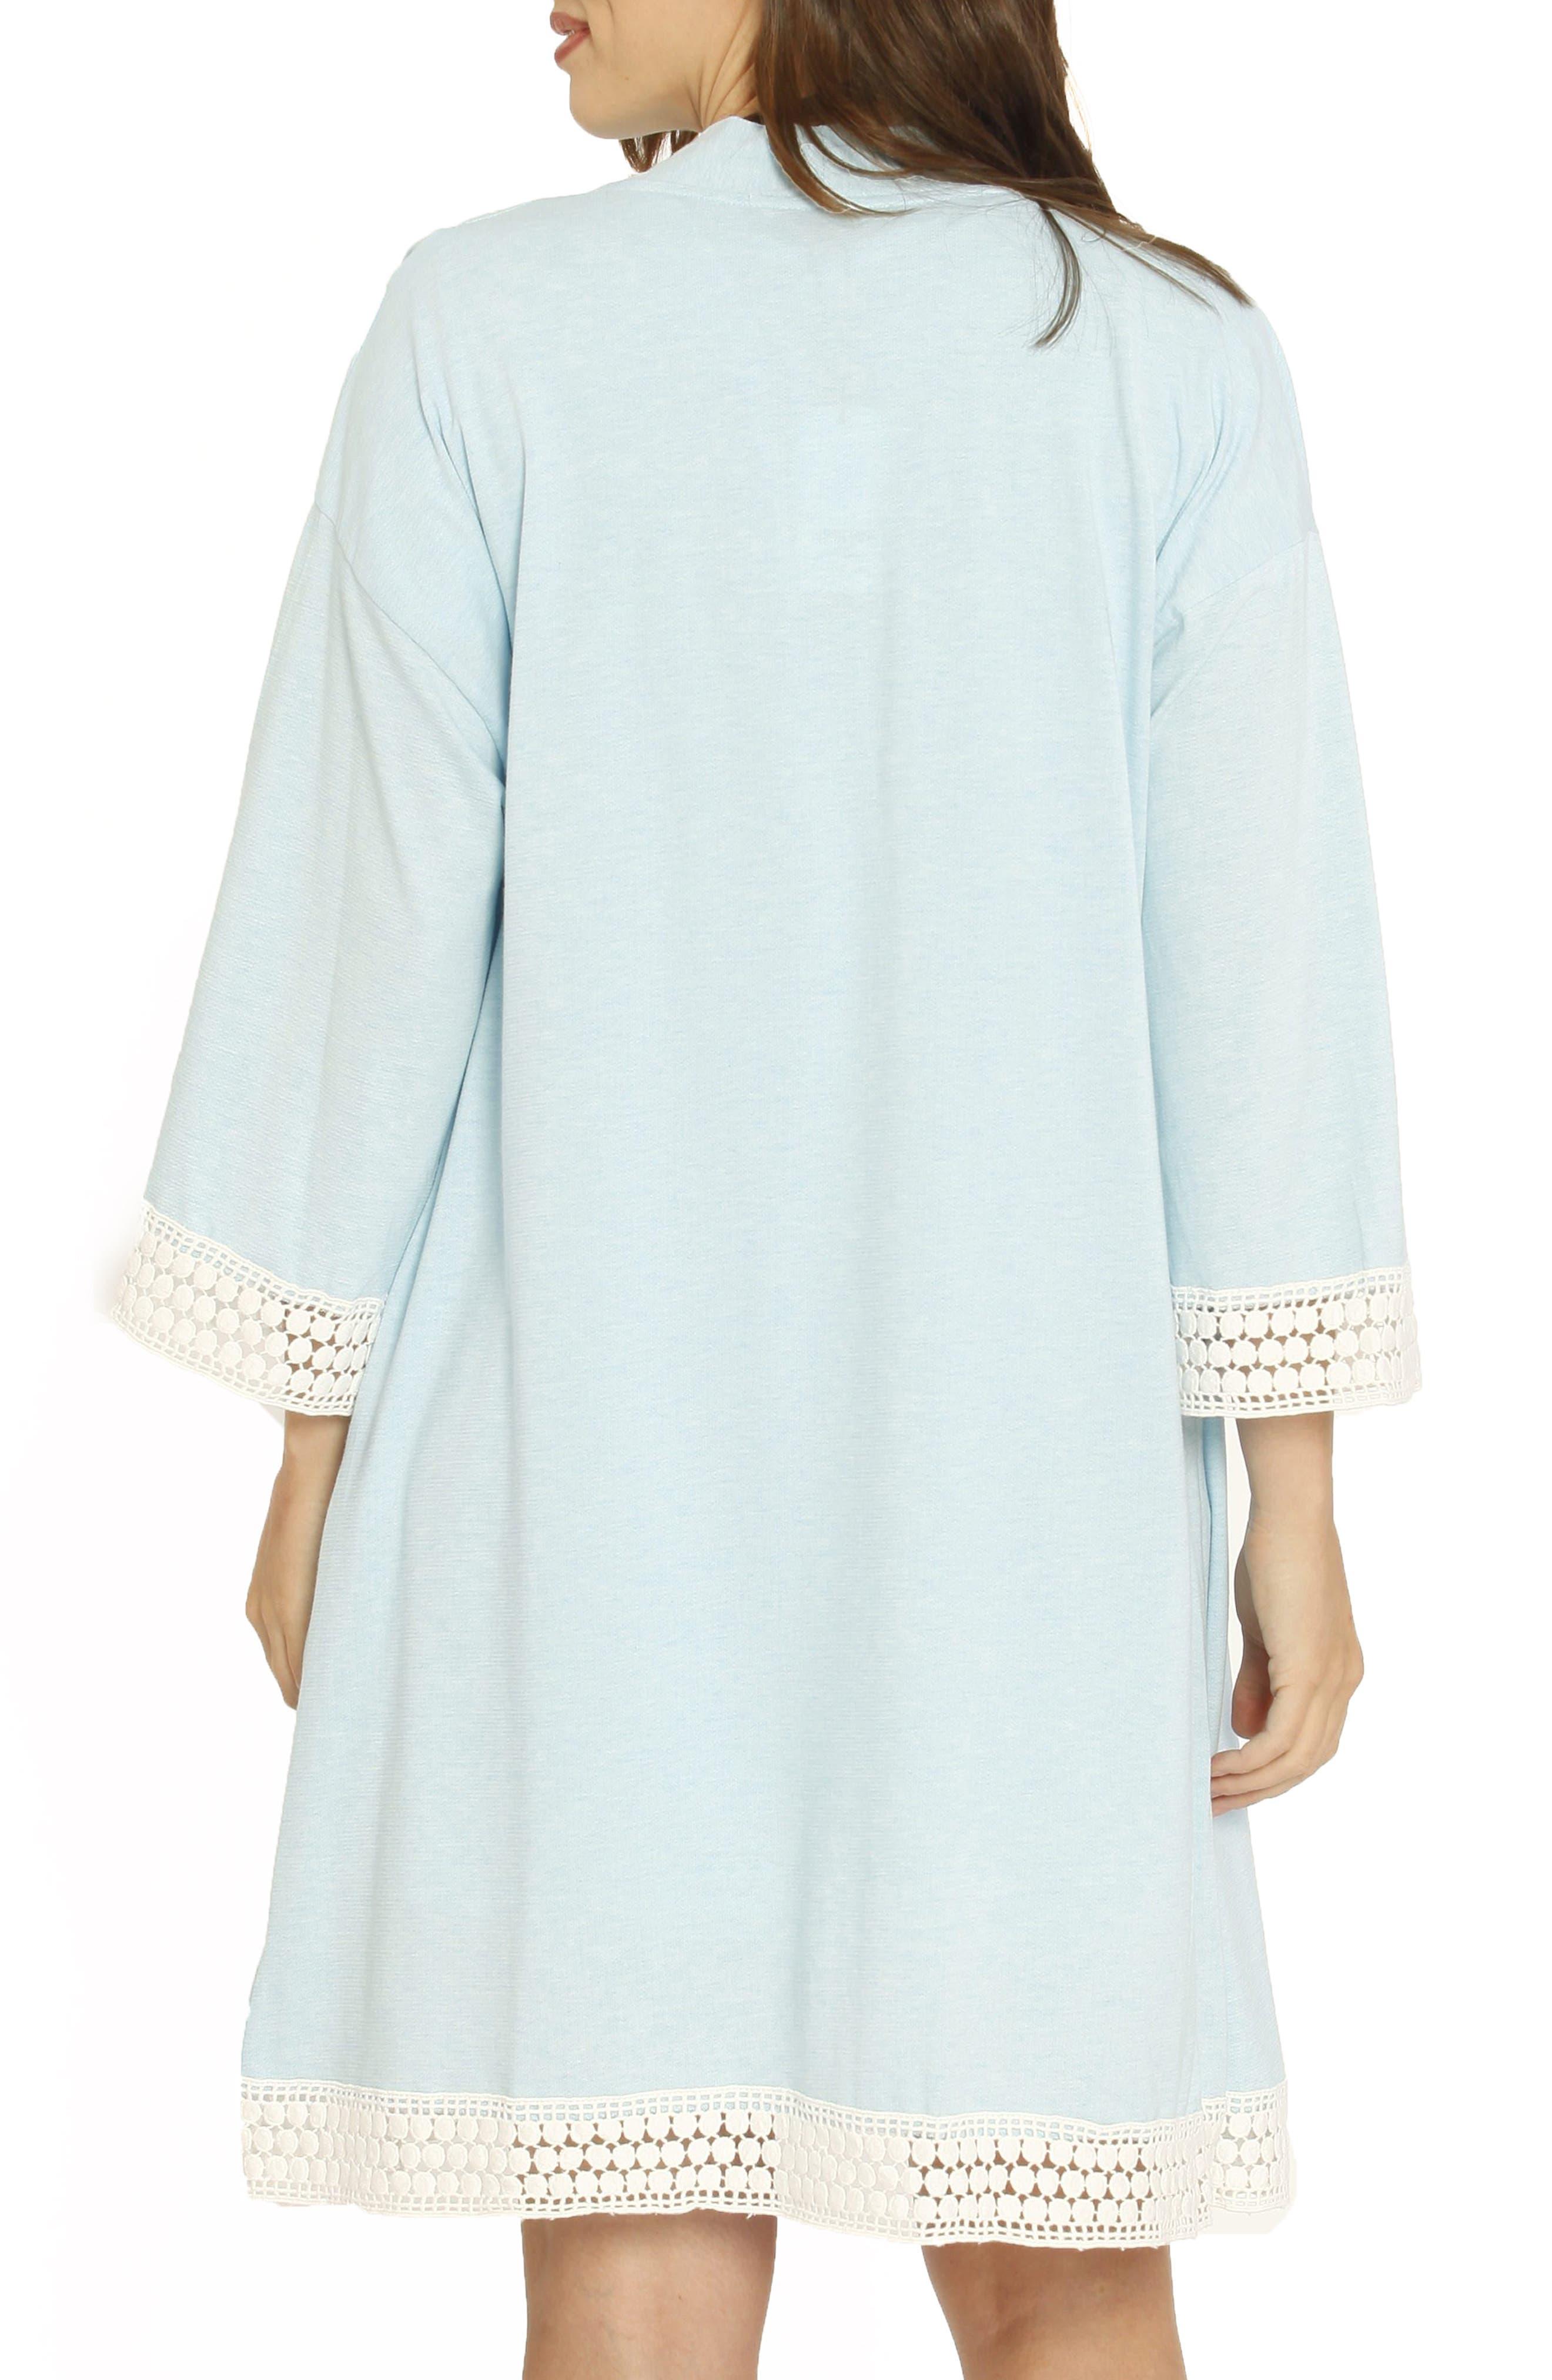 Ruby Maternity/Nursing Sleep Shirt, Robe & Baby Blanket Set,                             Alternate thumbnail 2, color,                             BLUE